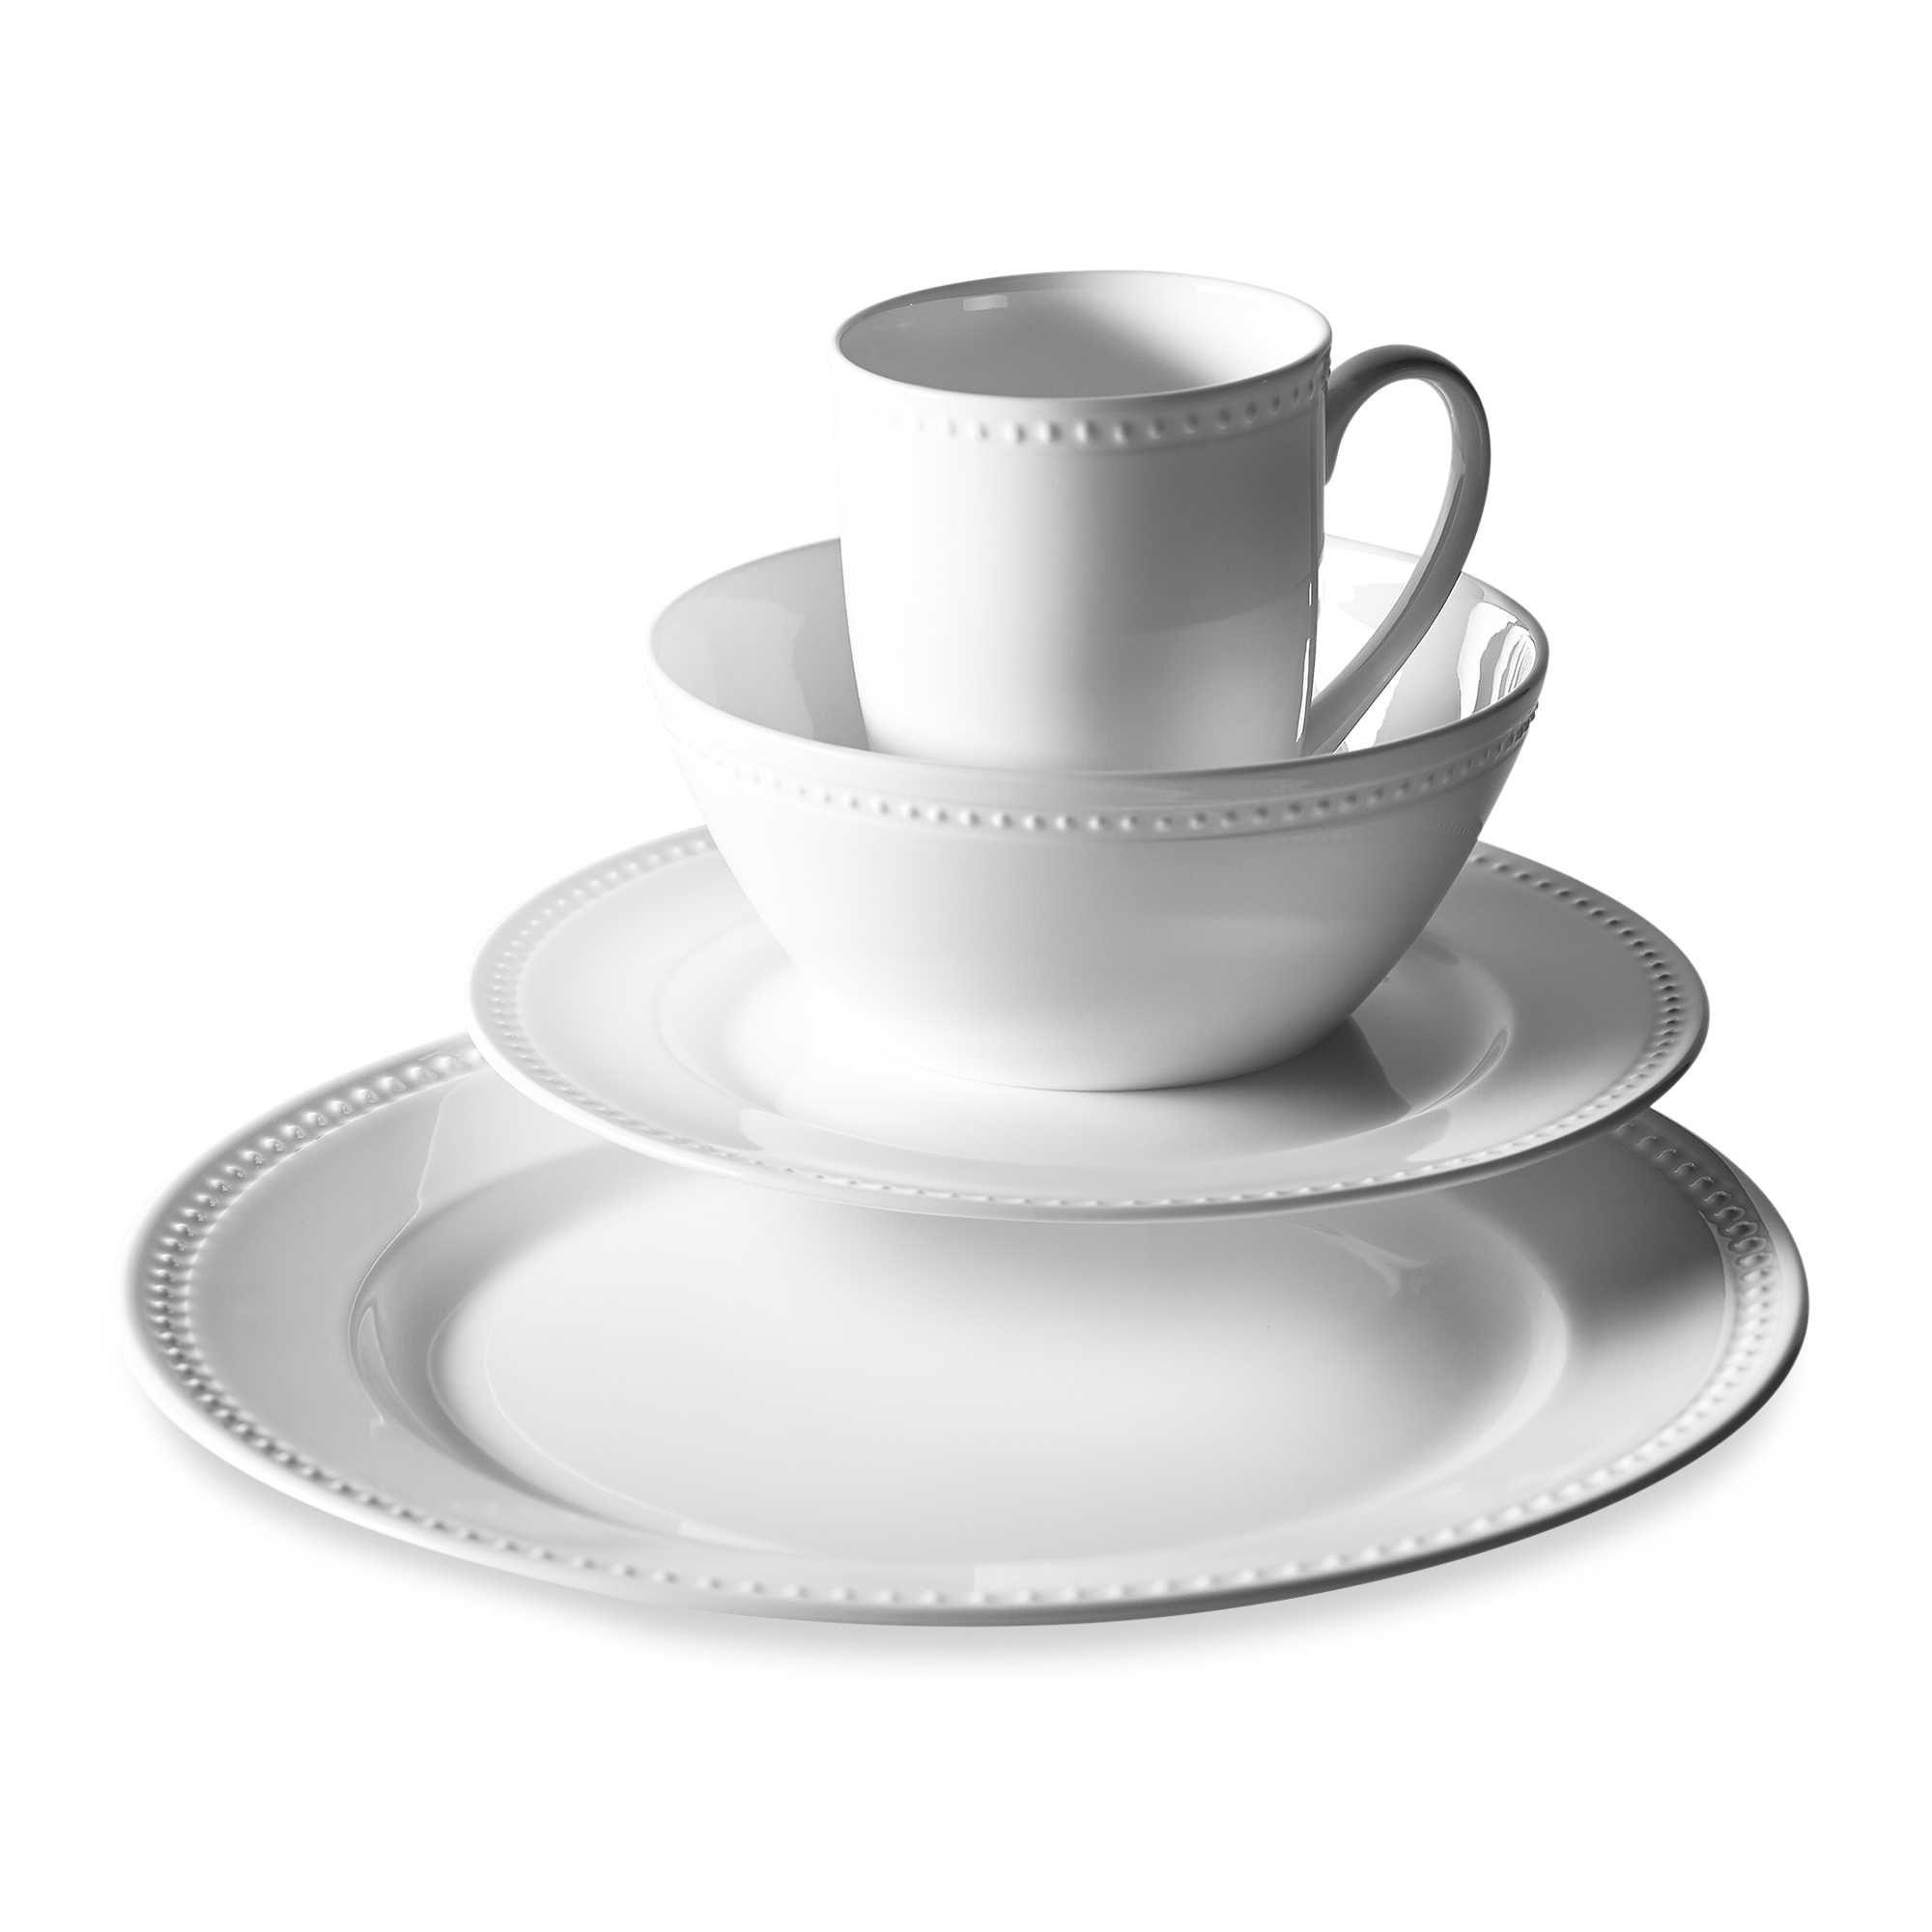 Tabletops Unlimited® Otella Bone China 16-Piece Dinnerware Set. BB&B ...